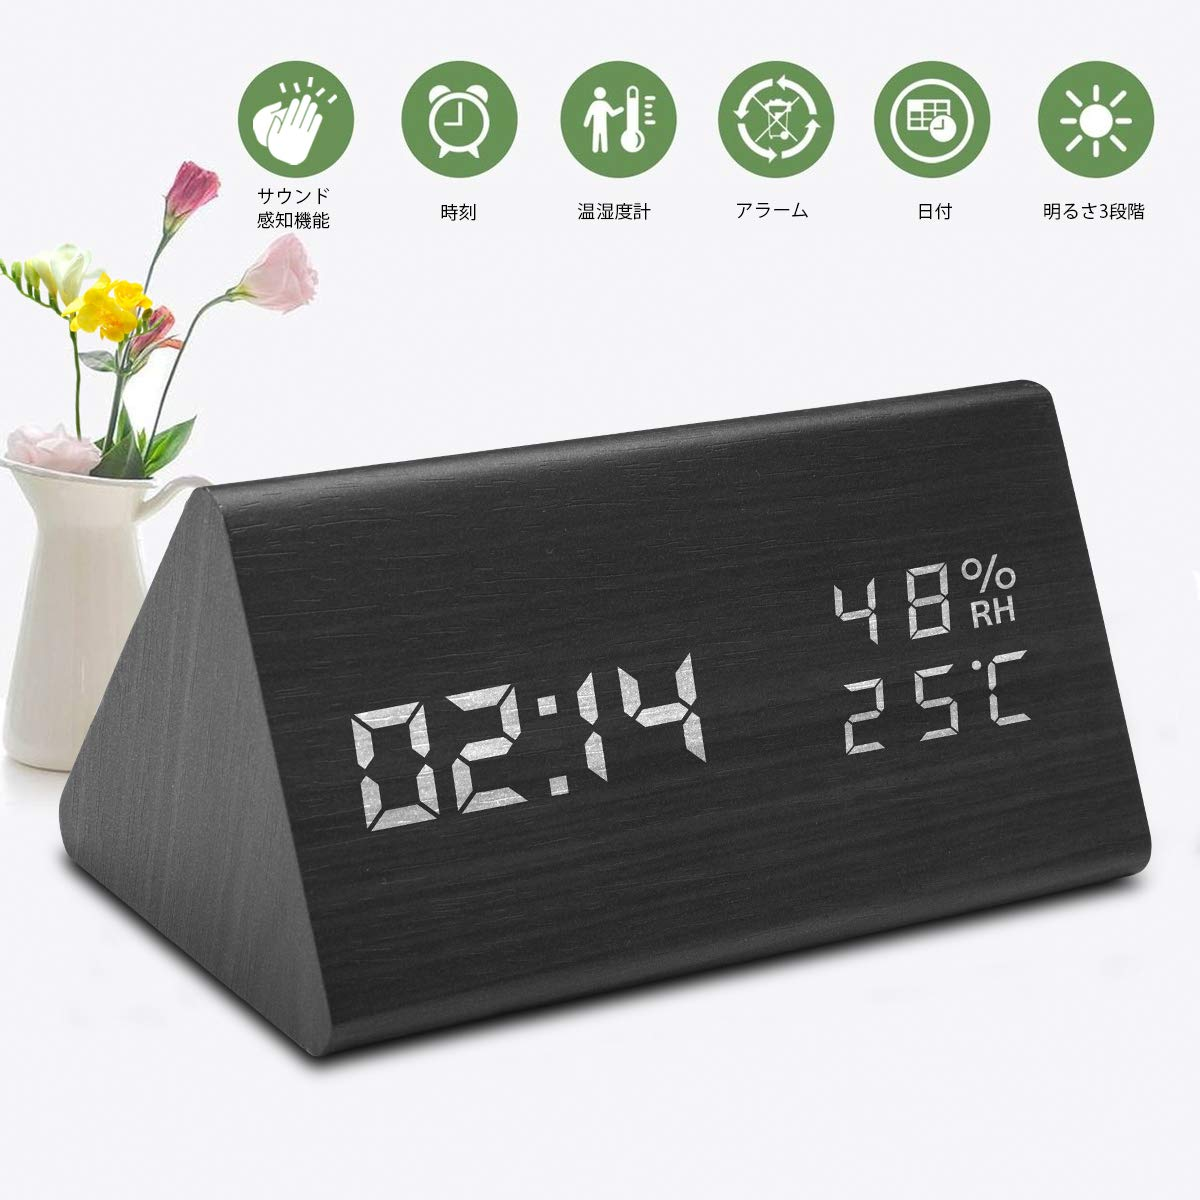 2dc01e9761 LED 目覚まし置き時計, 木目調 デジタル アラームクロック usb充電 電池 音声感知 温度 カレンダ